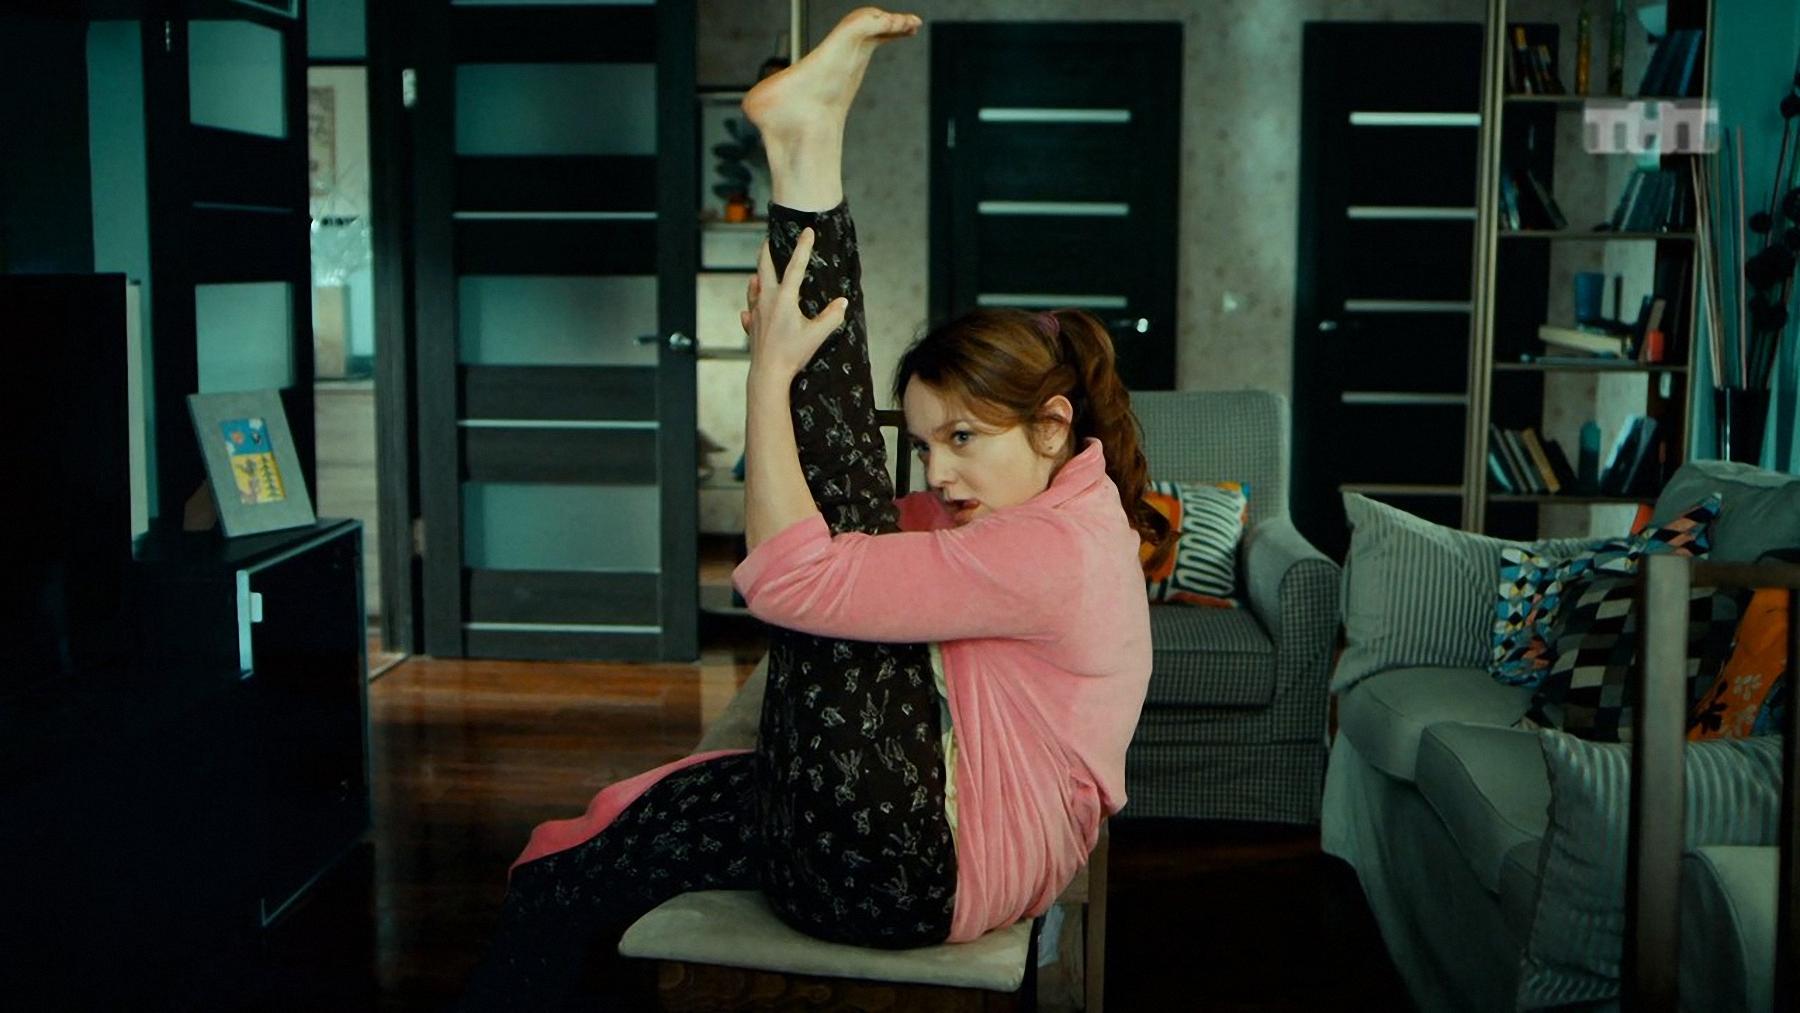 Таня танцует стрептиз 23 фотография